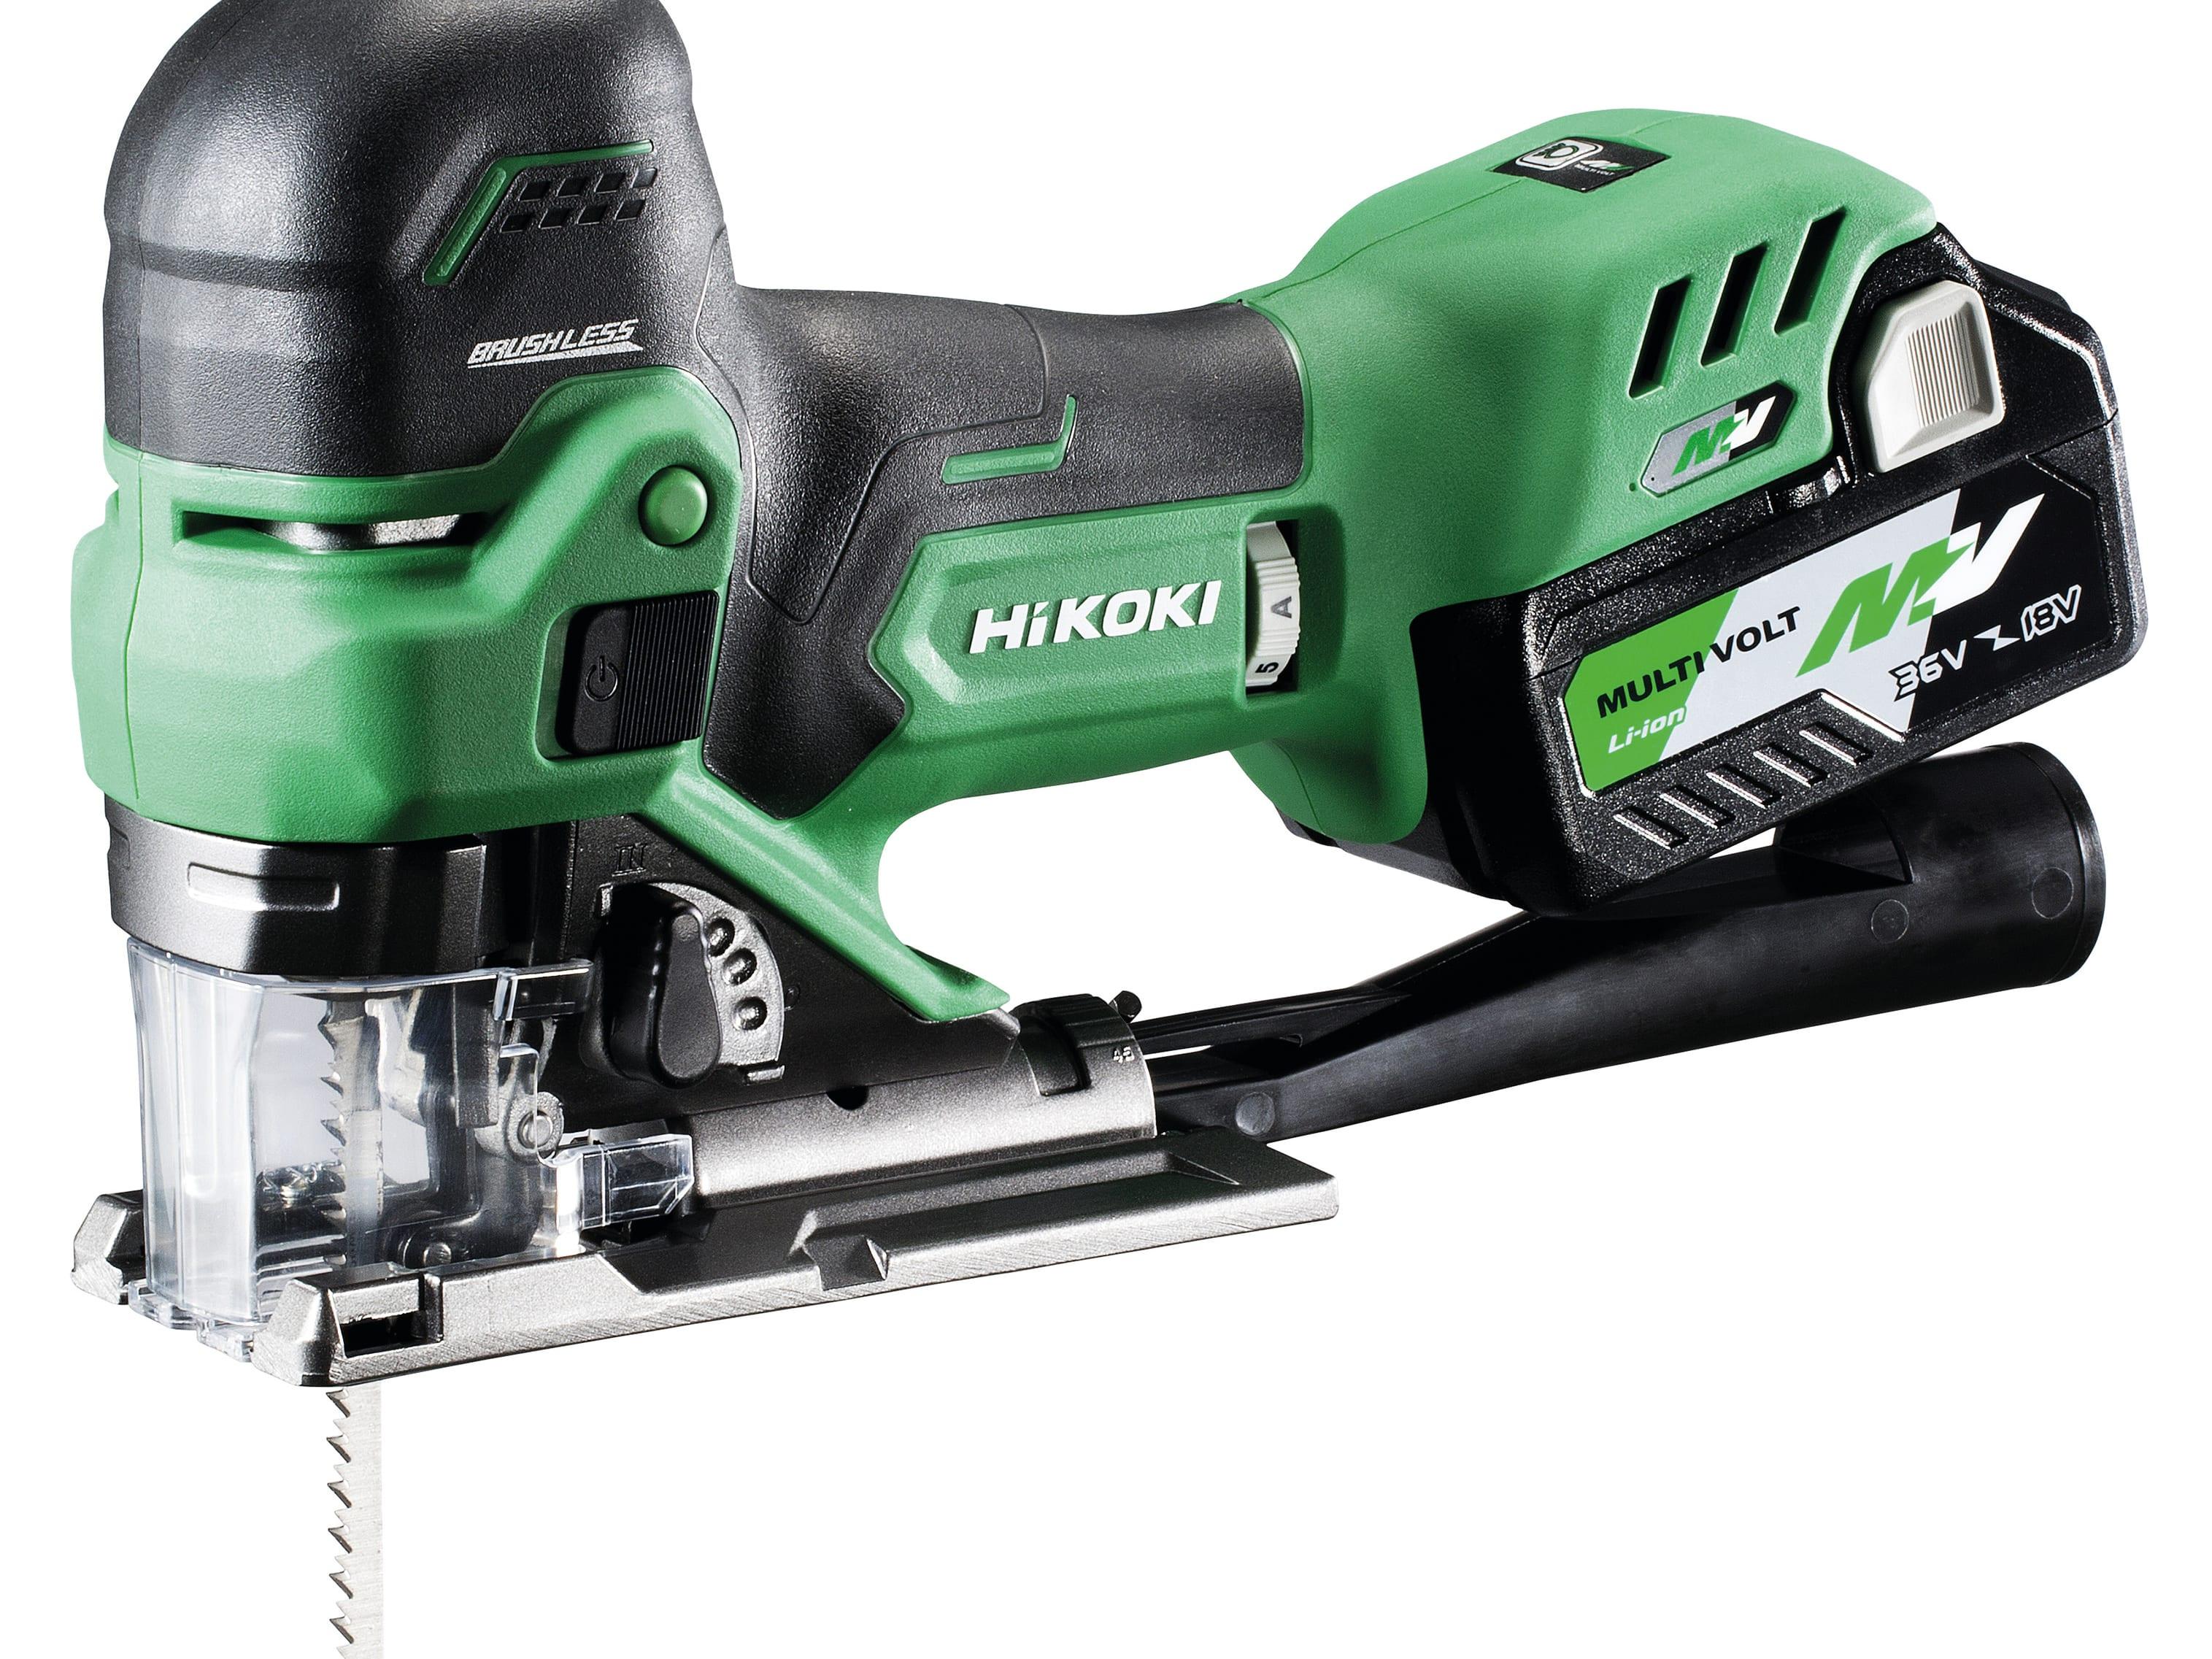 HiKOKI High Performance Power Tools